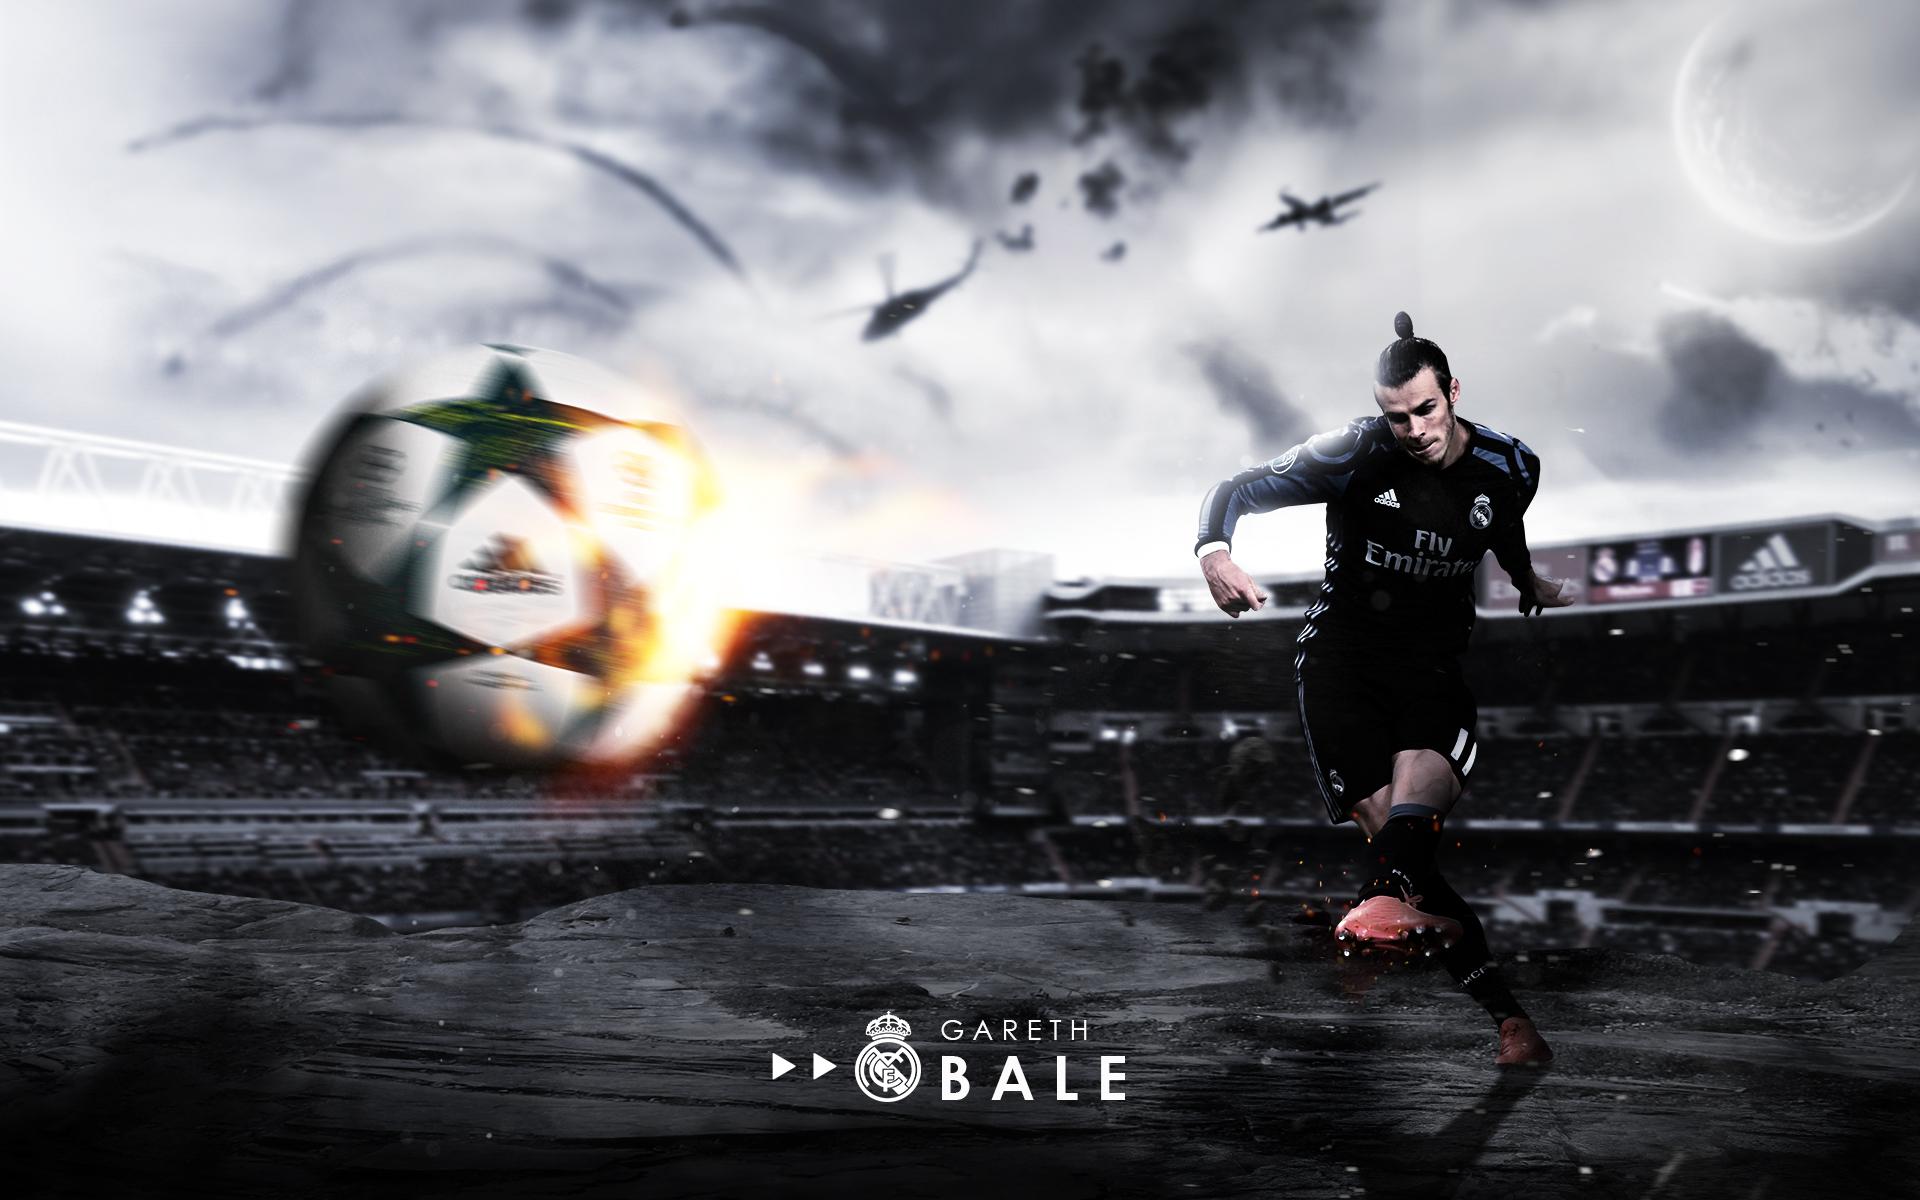 Gareth Bale Wallpaper by RakaGFX.jpg